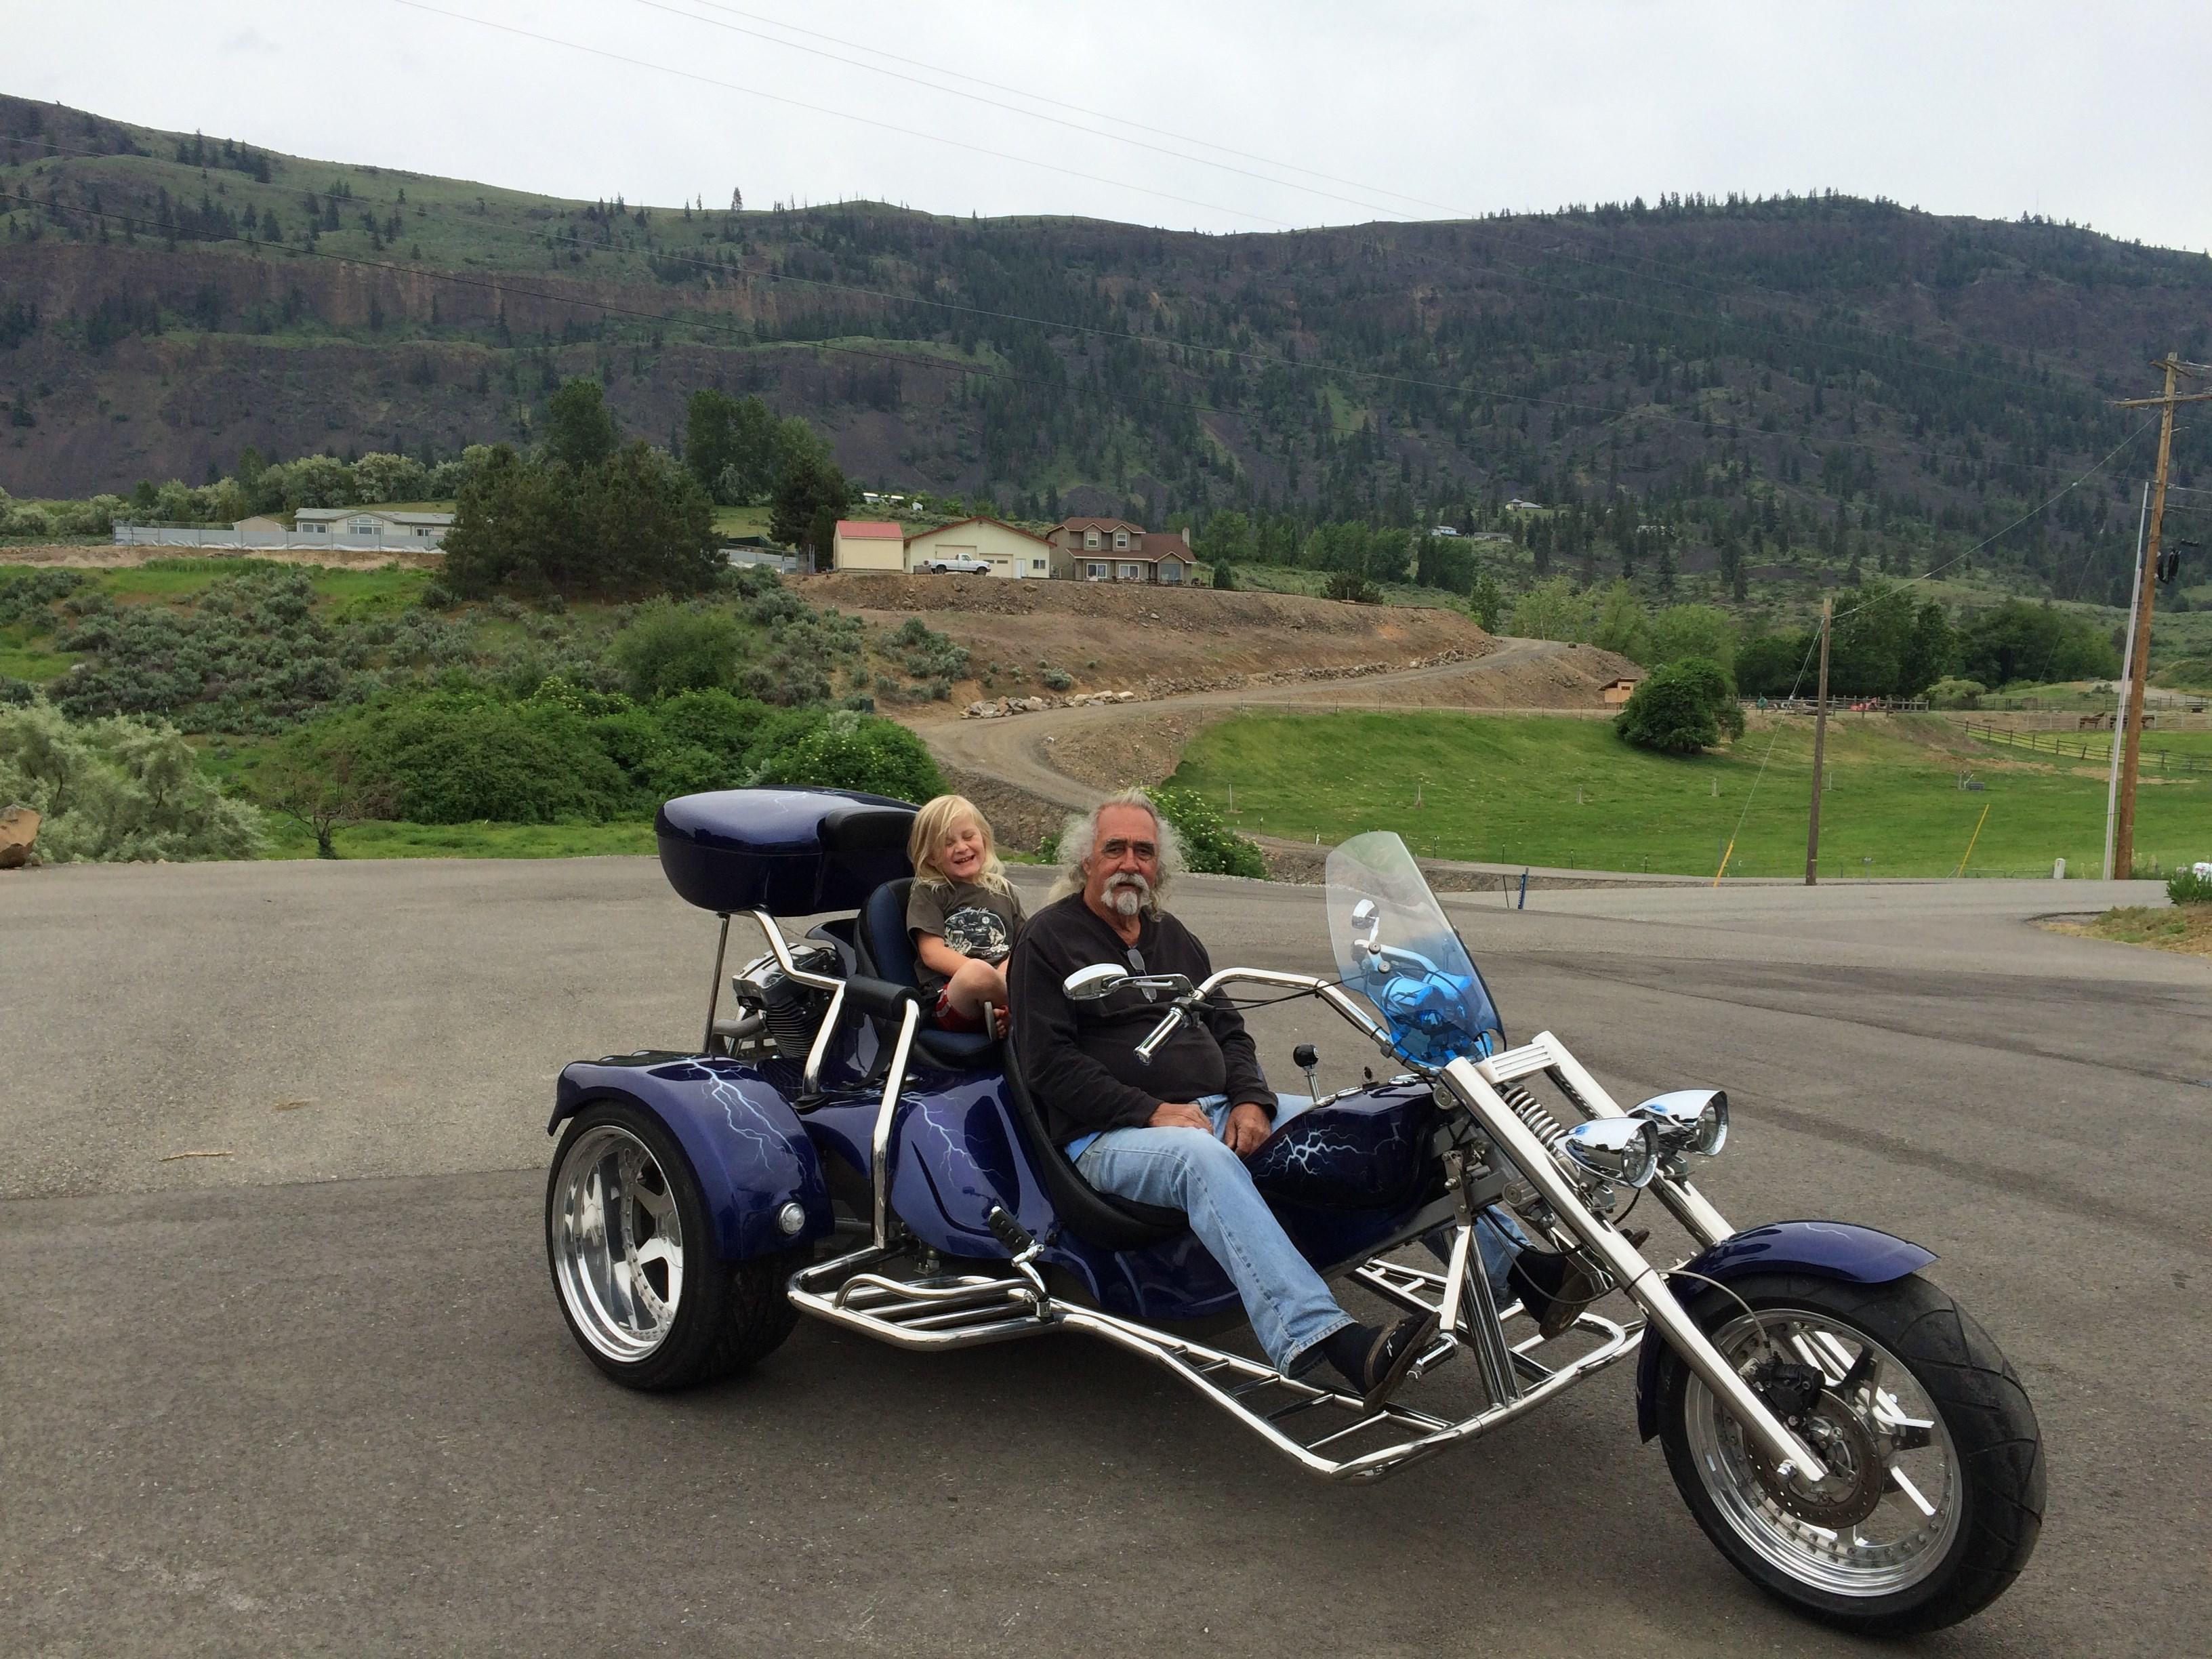 Harley Davidson Motorcycles For Sale Minnesota >> Harley-Davidson® Trikes for Sale (1,254 Bikes, Page 1) | ChopperExchange